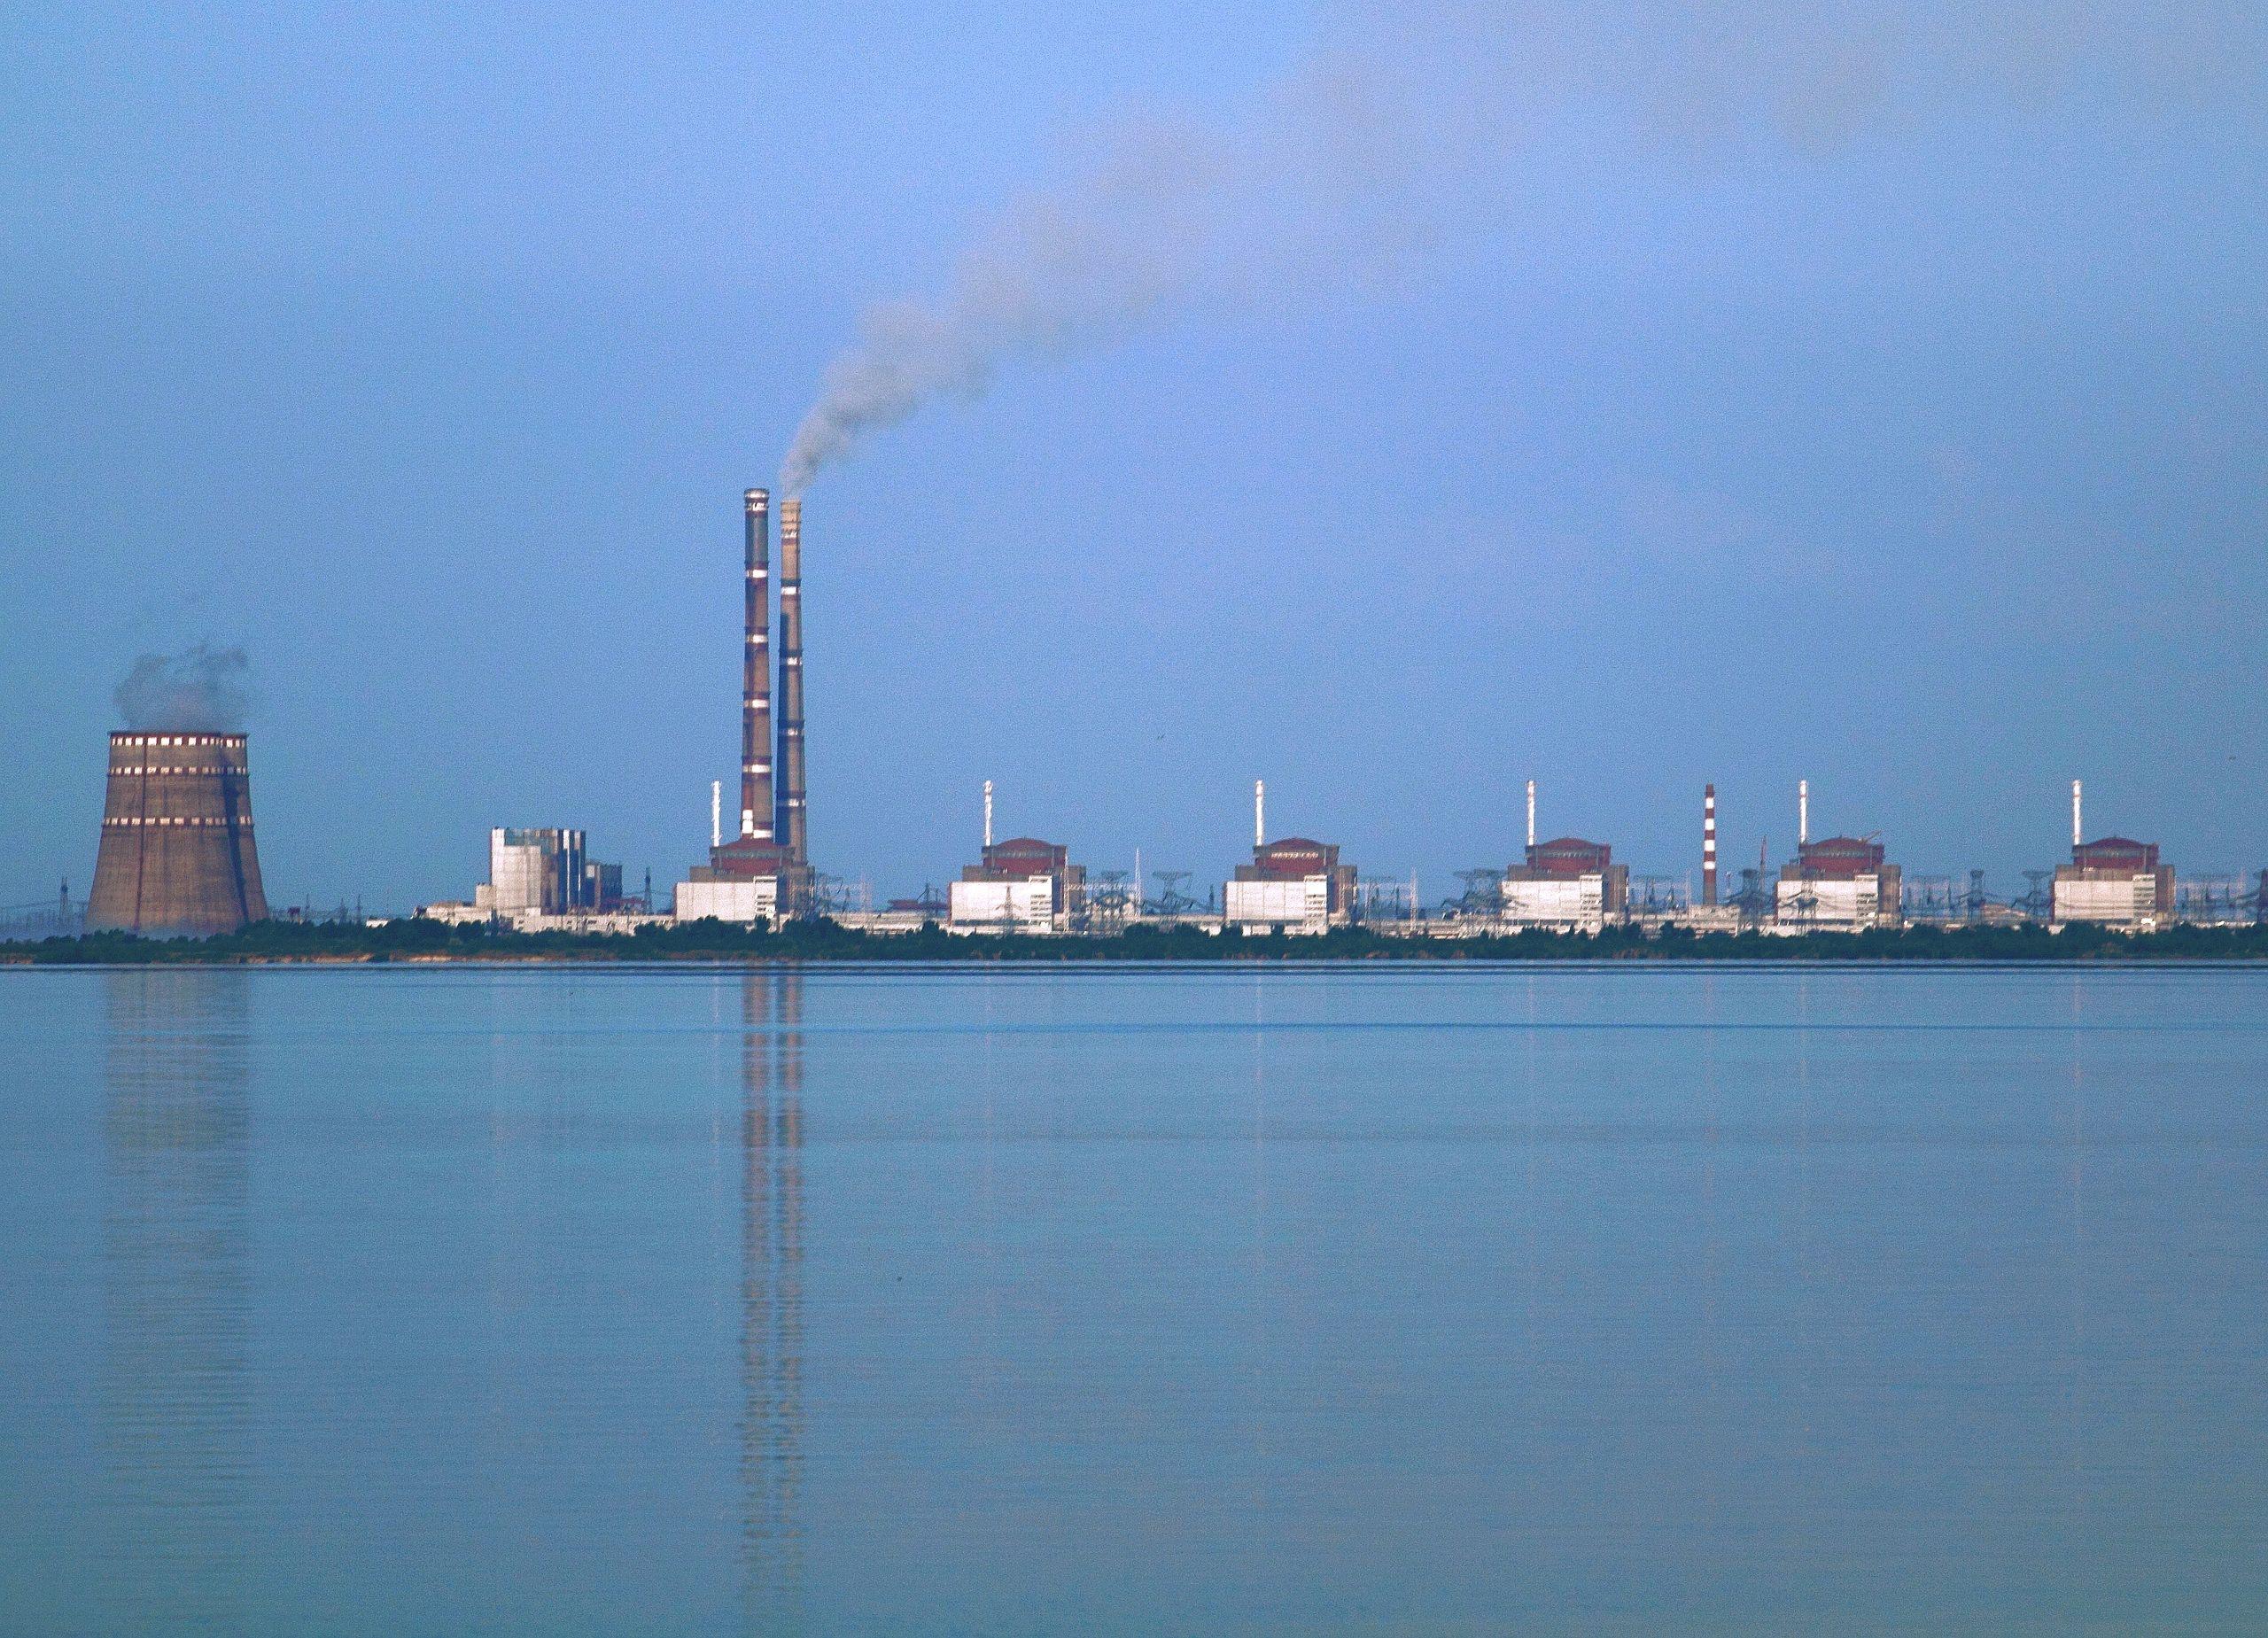 Atomkraftwerk in Saporoschje (Bild: Ralf 1969 via CC BY-SA 3.0)